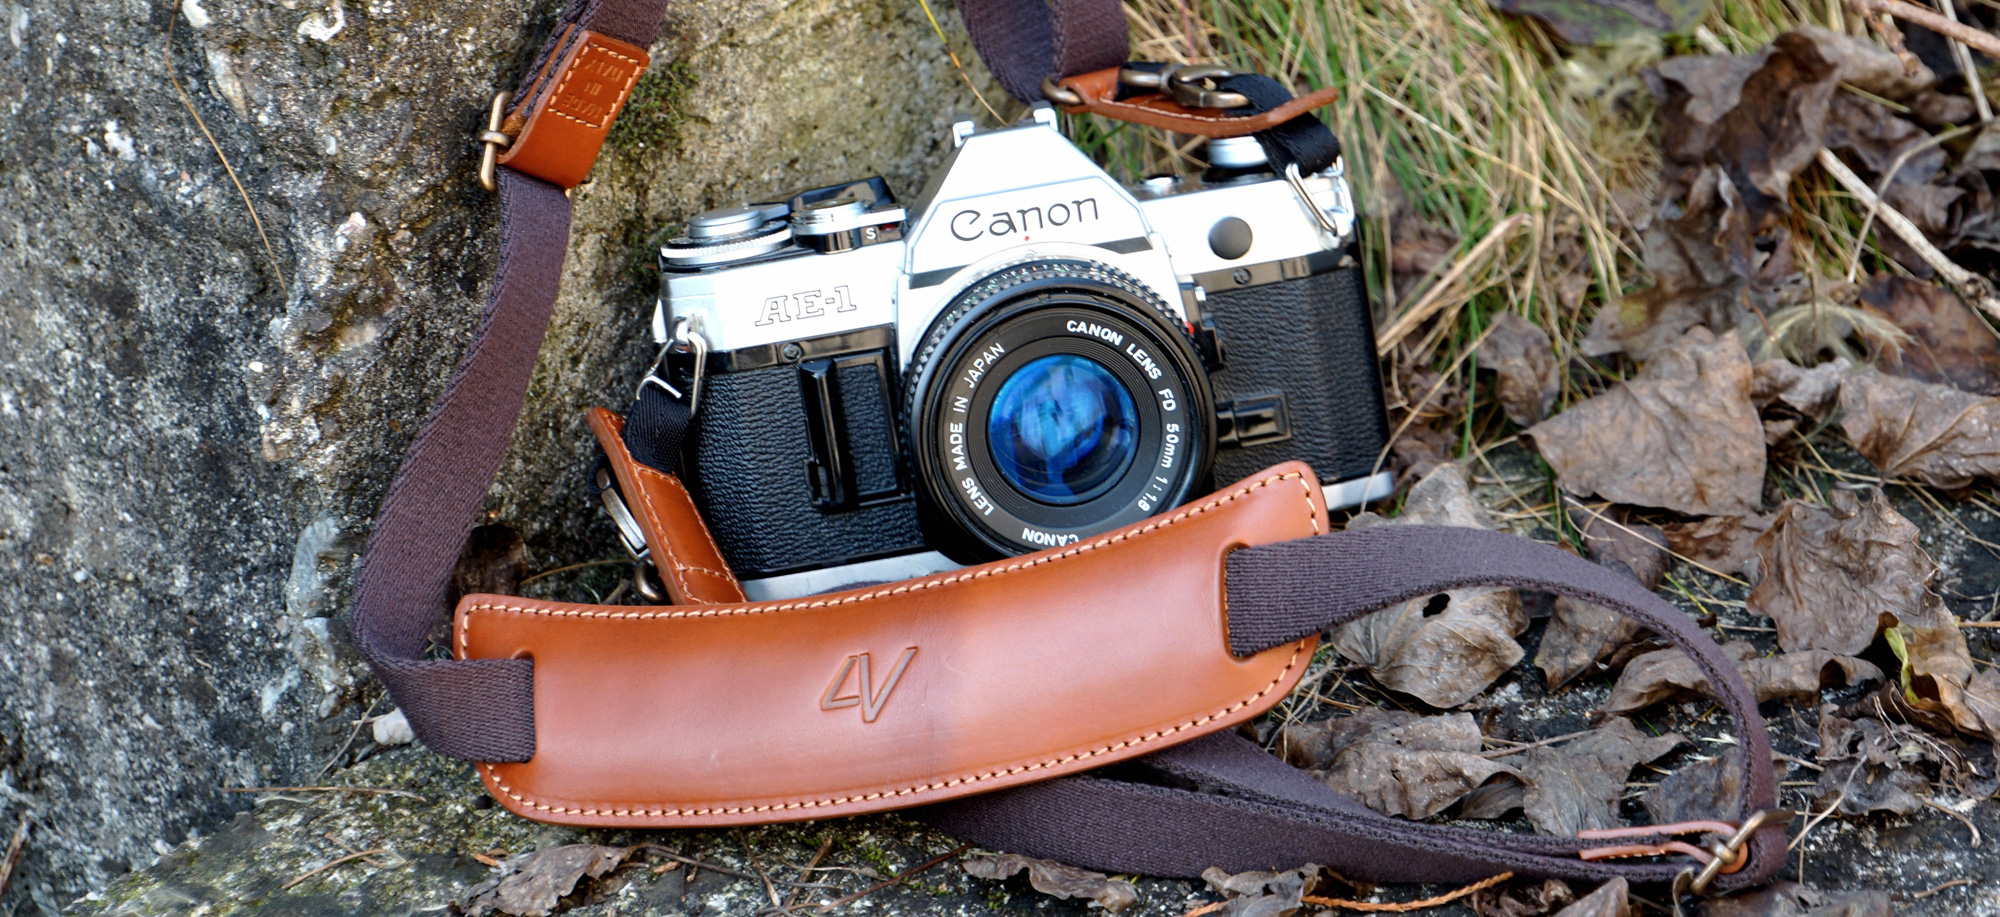 4vdesign,相機背帶配件